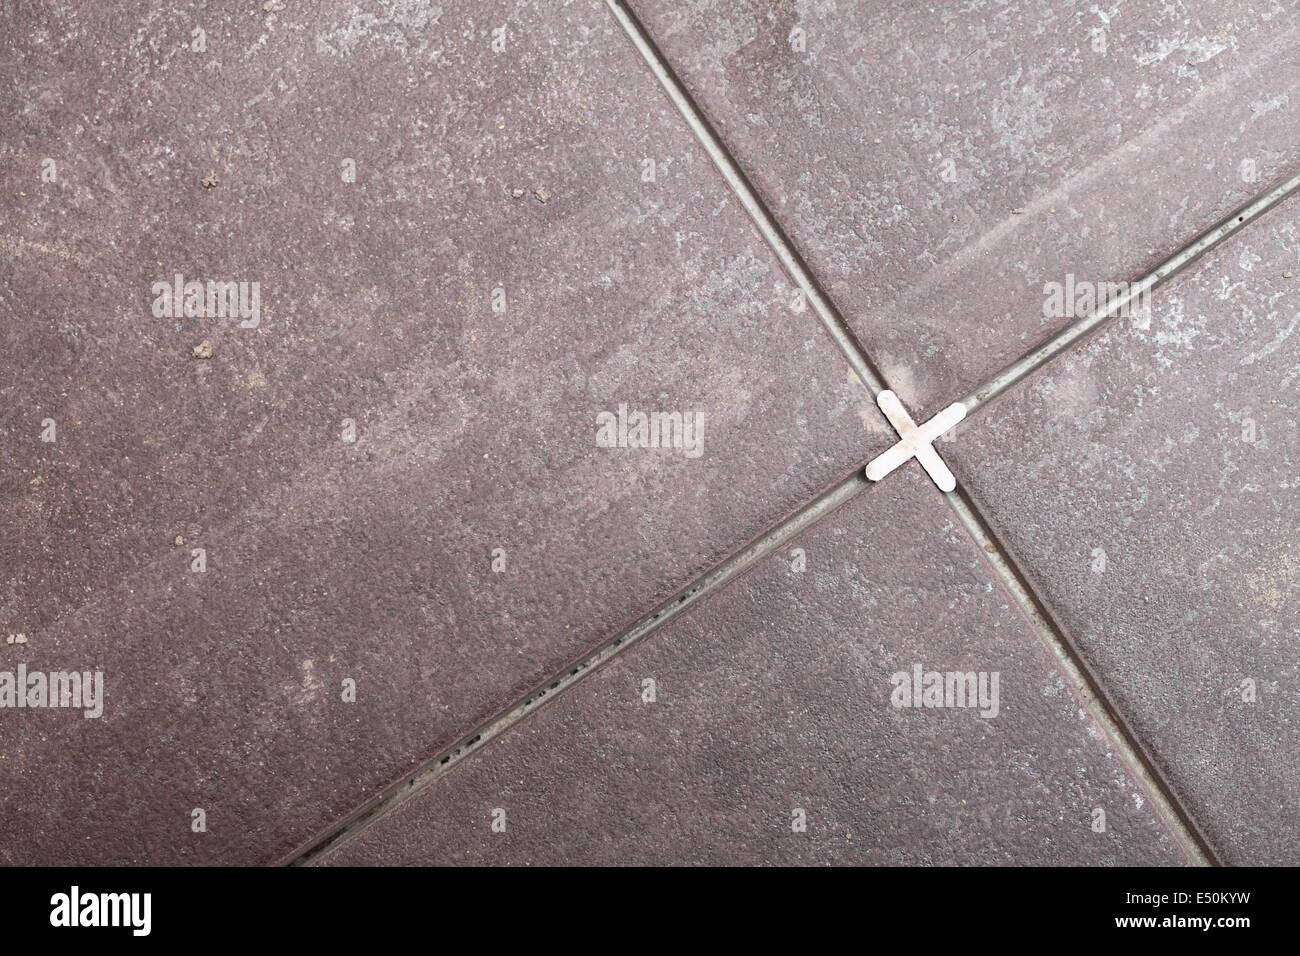 Tiling preparation floor tiles background stock photo royalty free tiling preparation floor tiles background dailygadgetfo Images